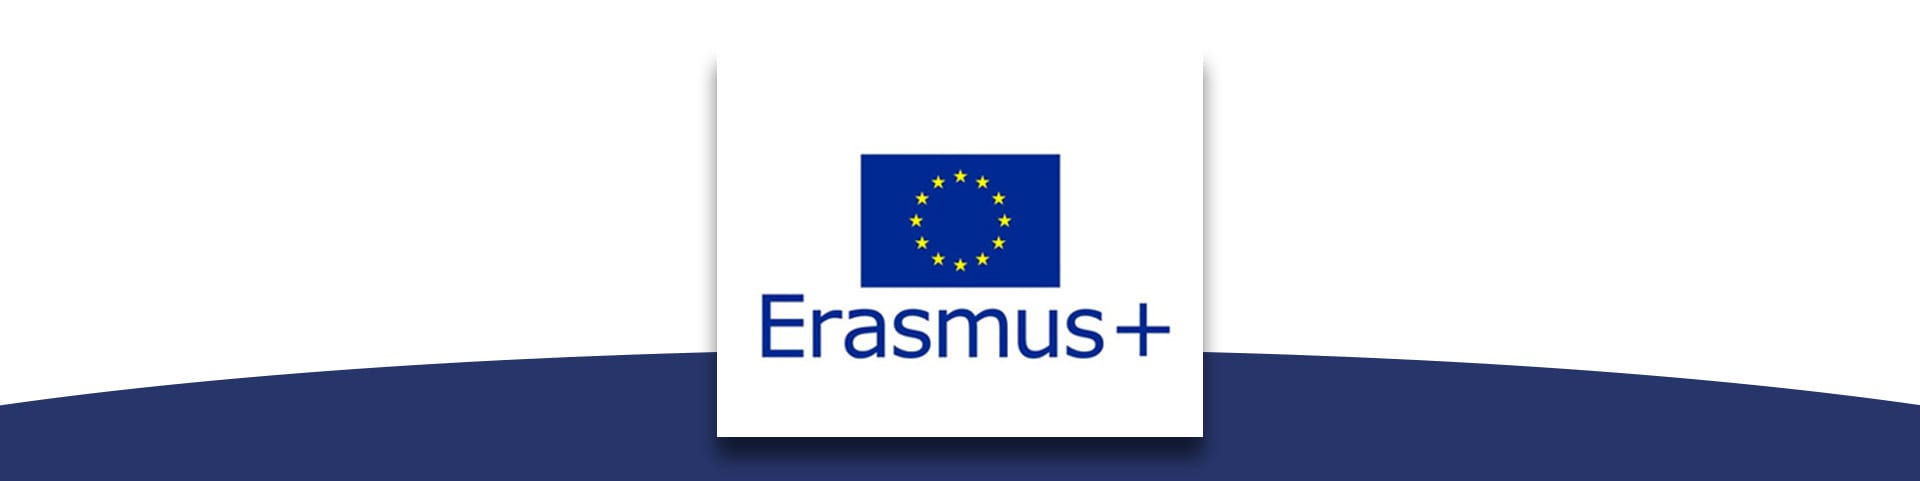 Erasmus+no alt text set su stradedeuropa.eu